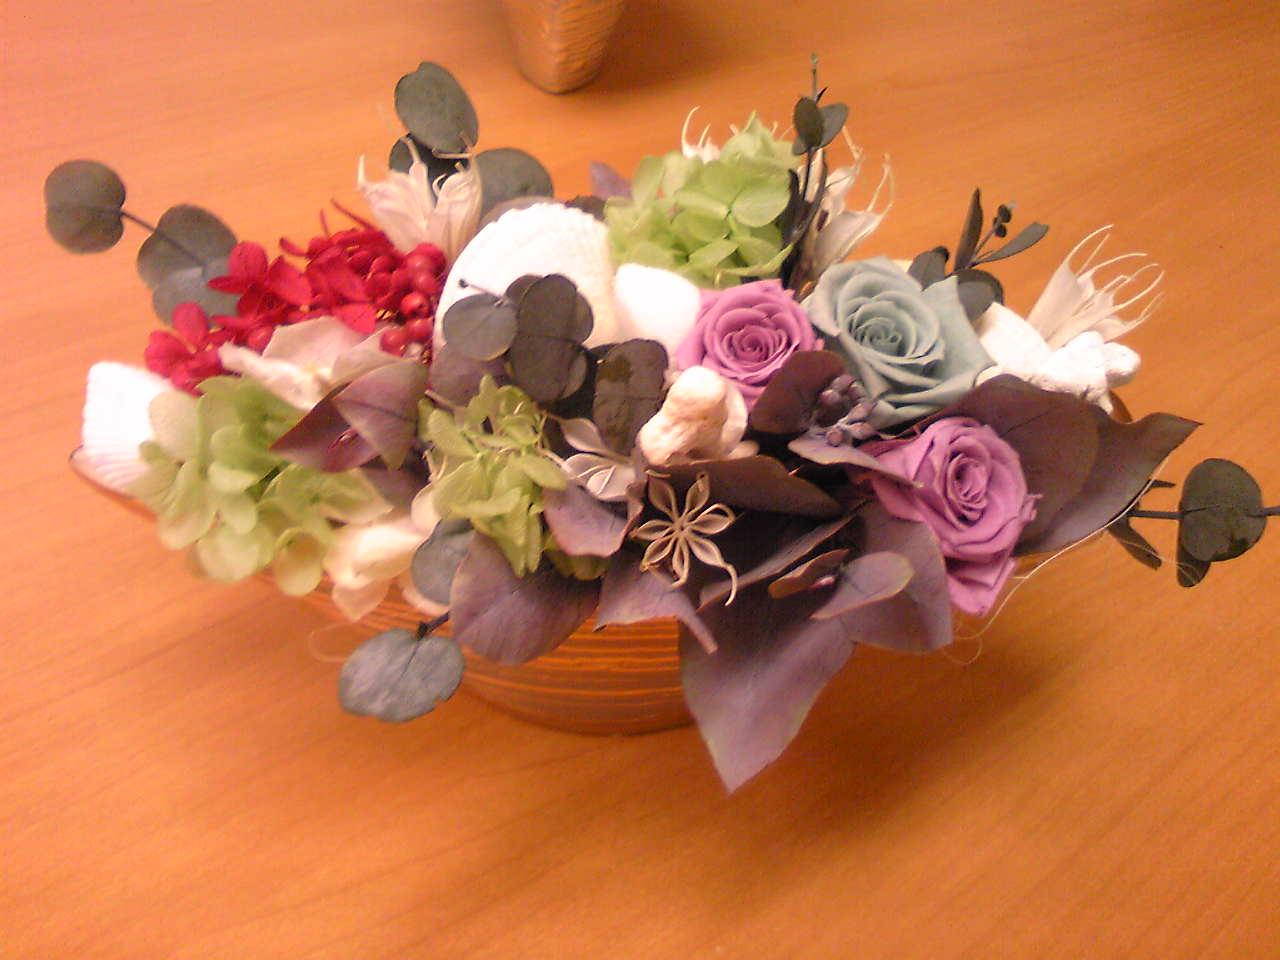 A preserved flower ararnge 1